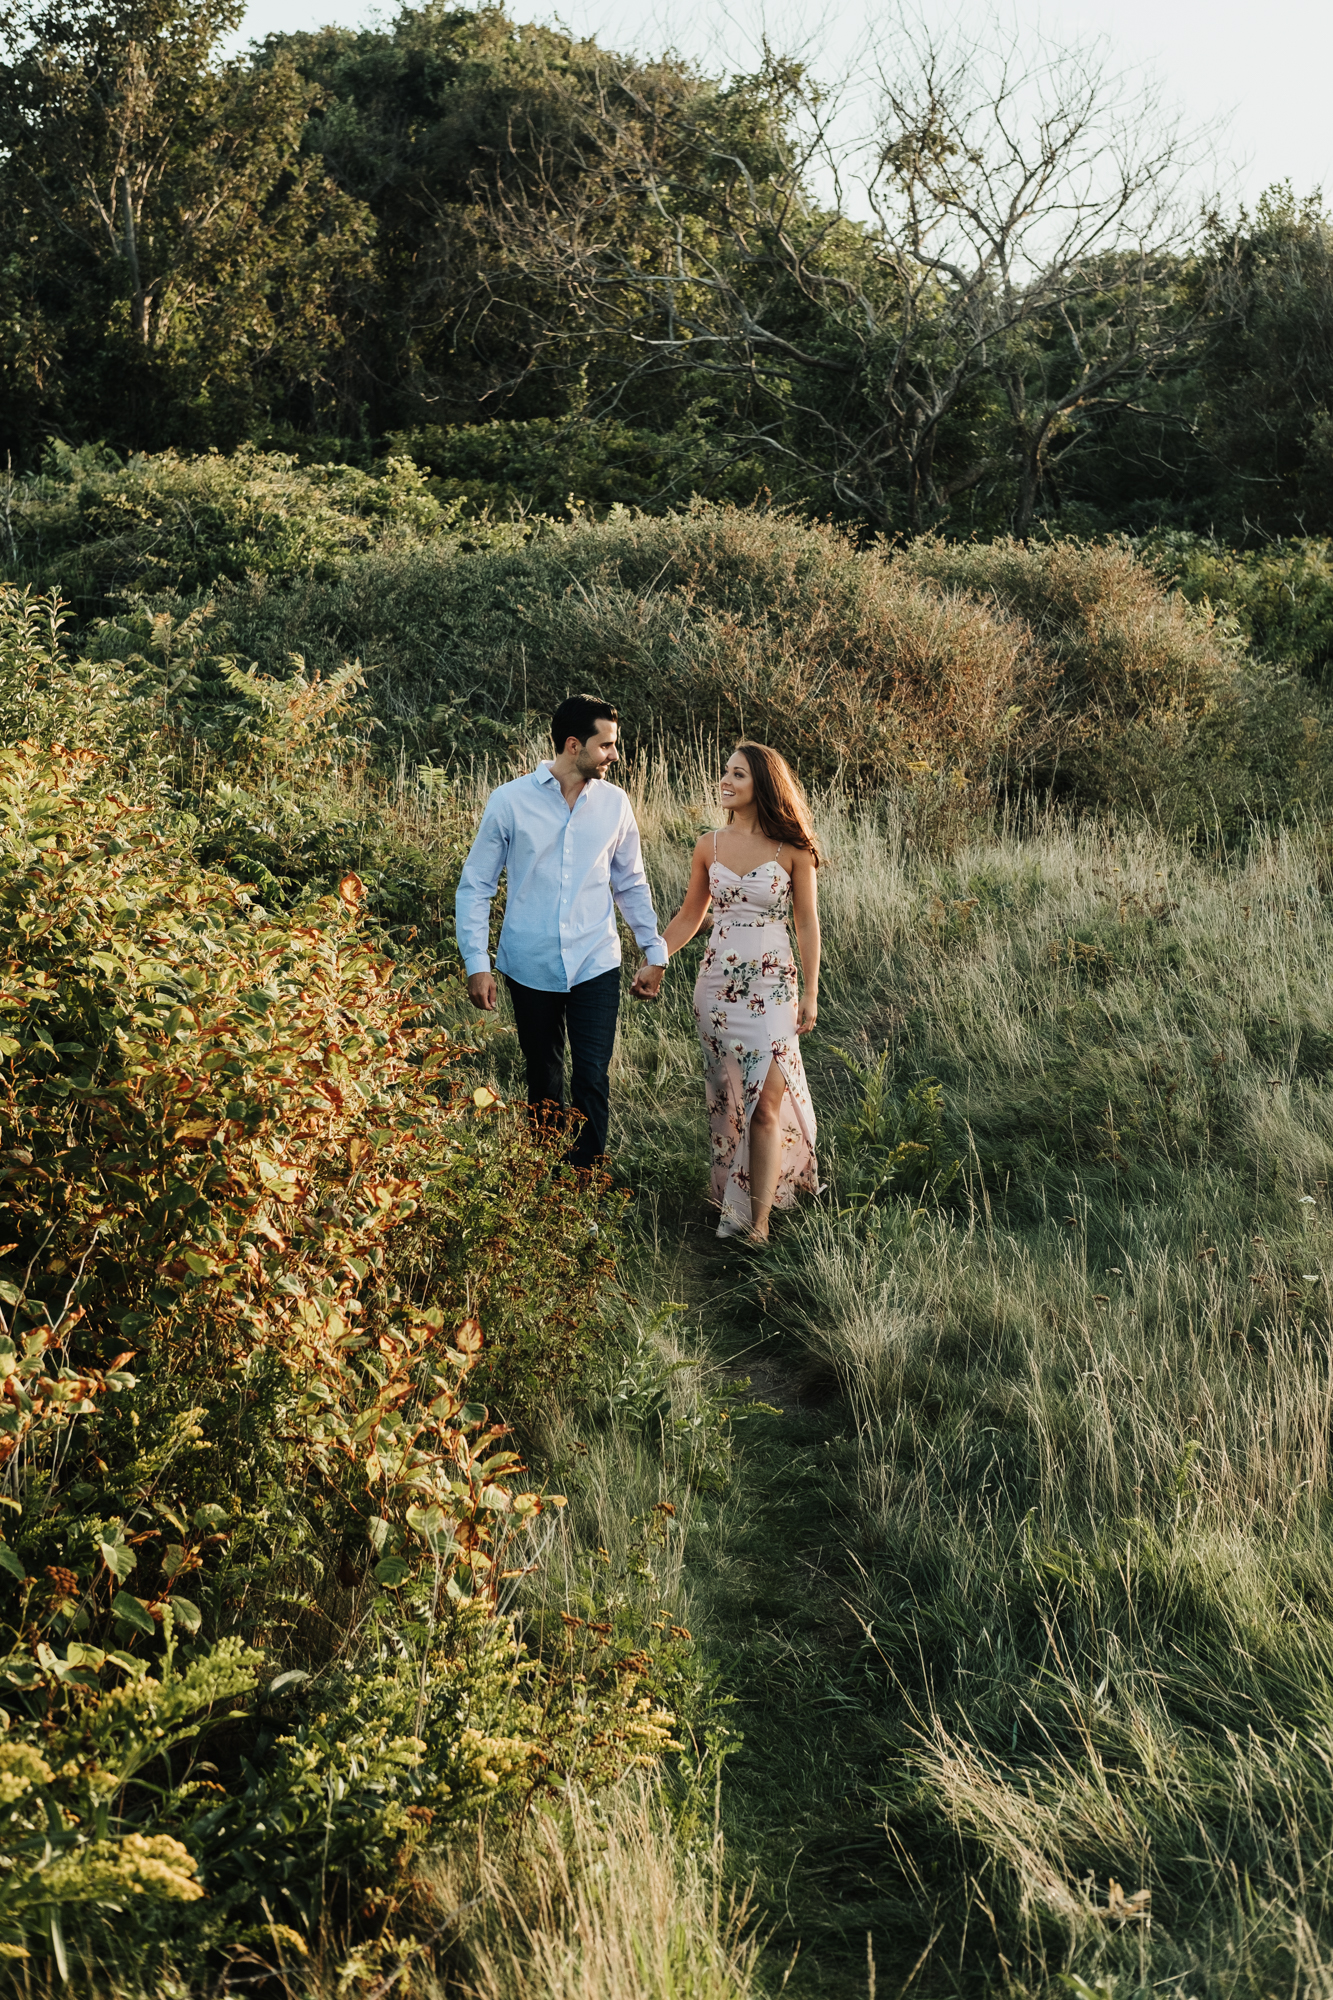 Wedding_Francis_Boucher_Engagement_Nahant_MA_2018-4.jpg